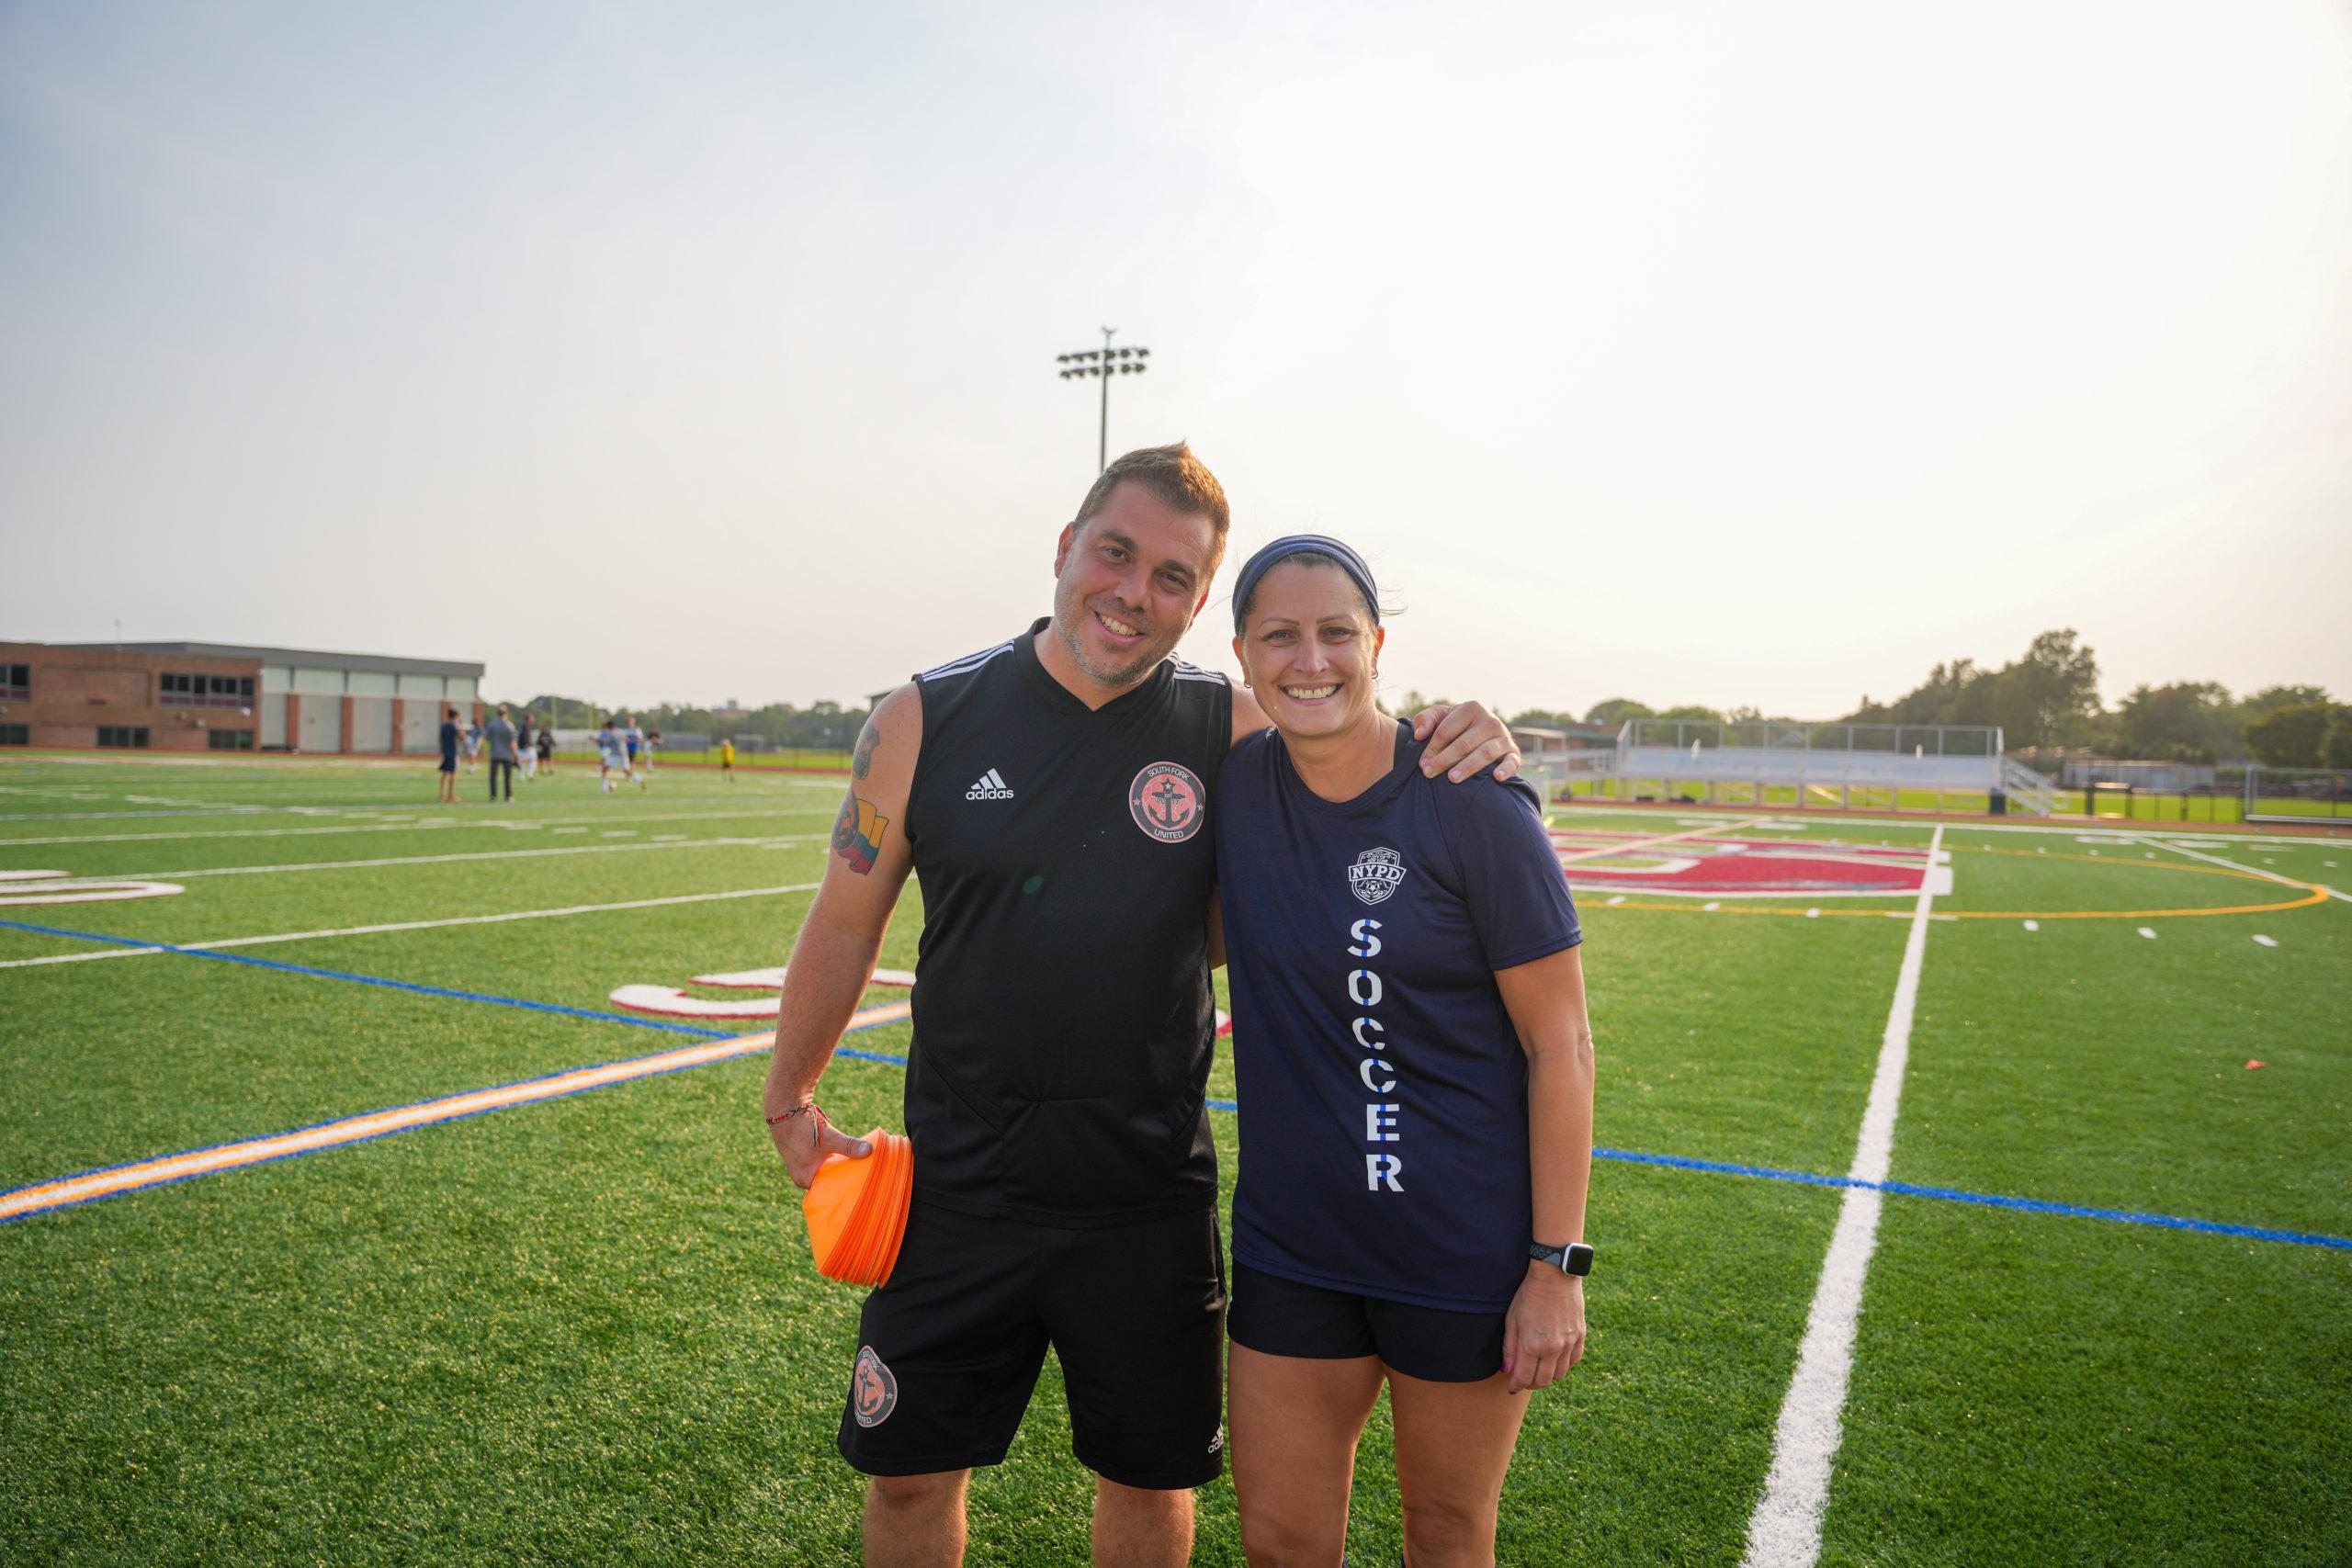 Gregory Fink, left, and Jennifer Marino.